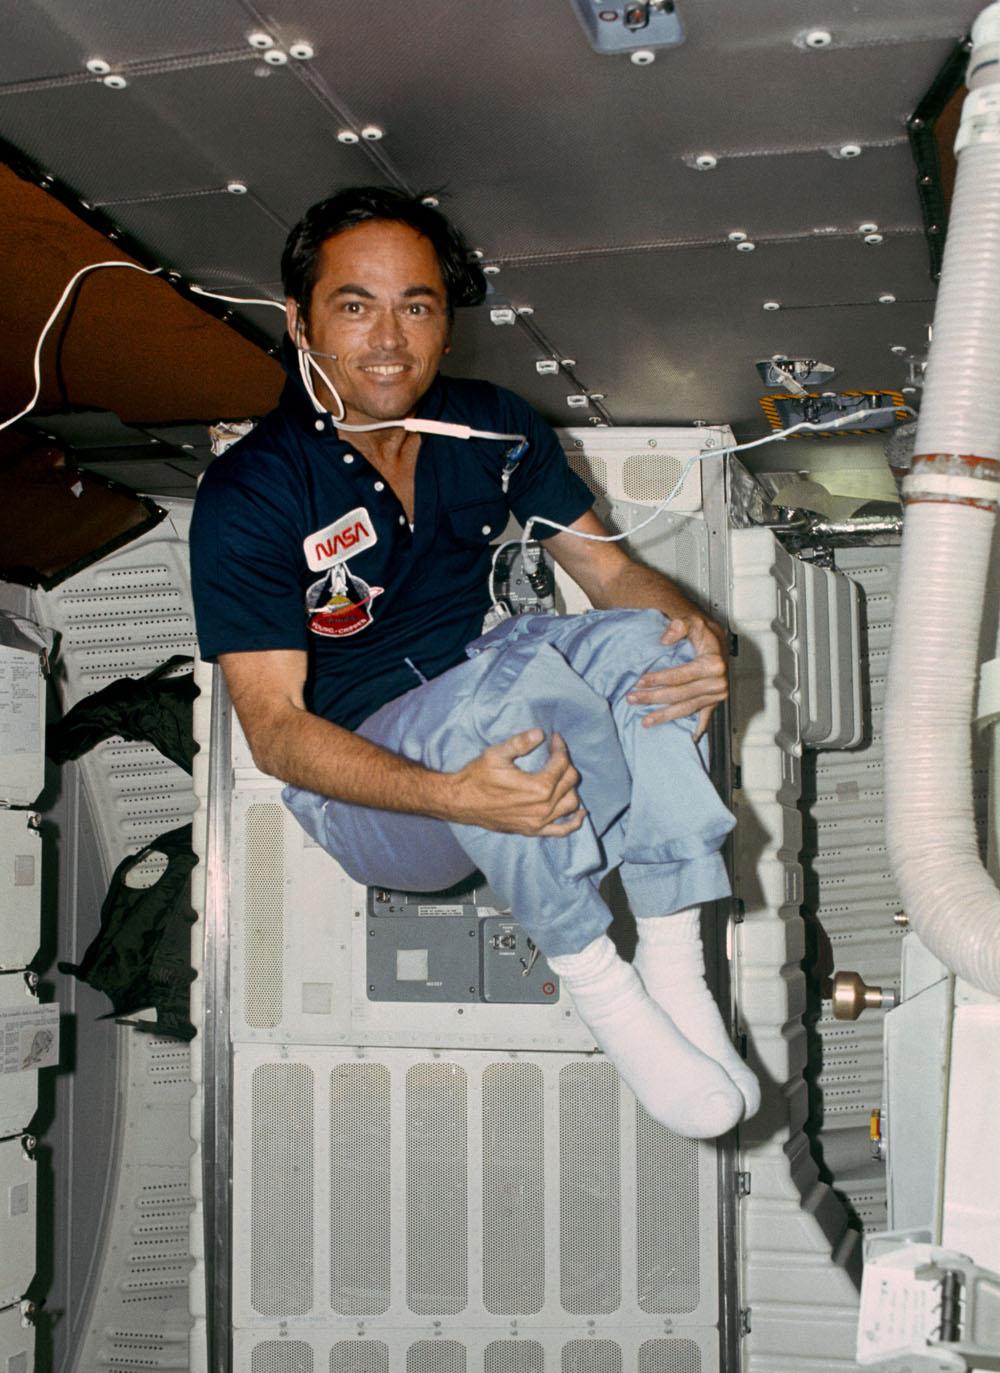 Space Shuttle's 1st Pilot: Q&A With Former NASA Astronaut Bob Crippen